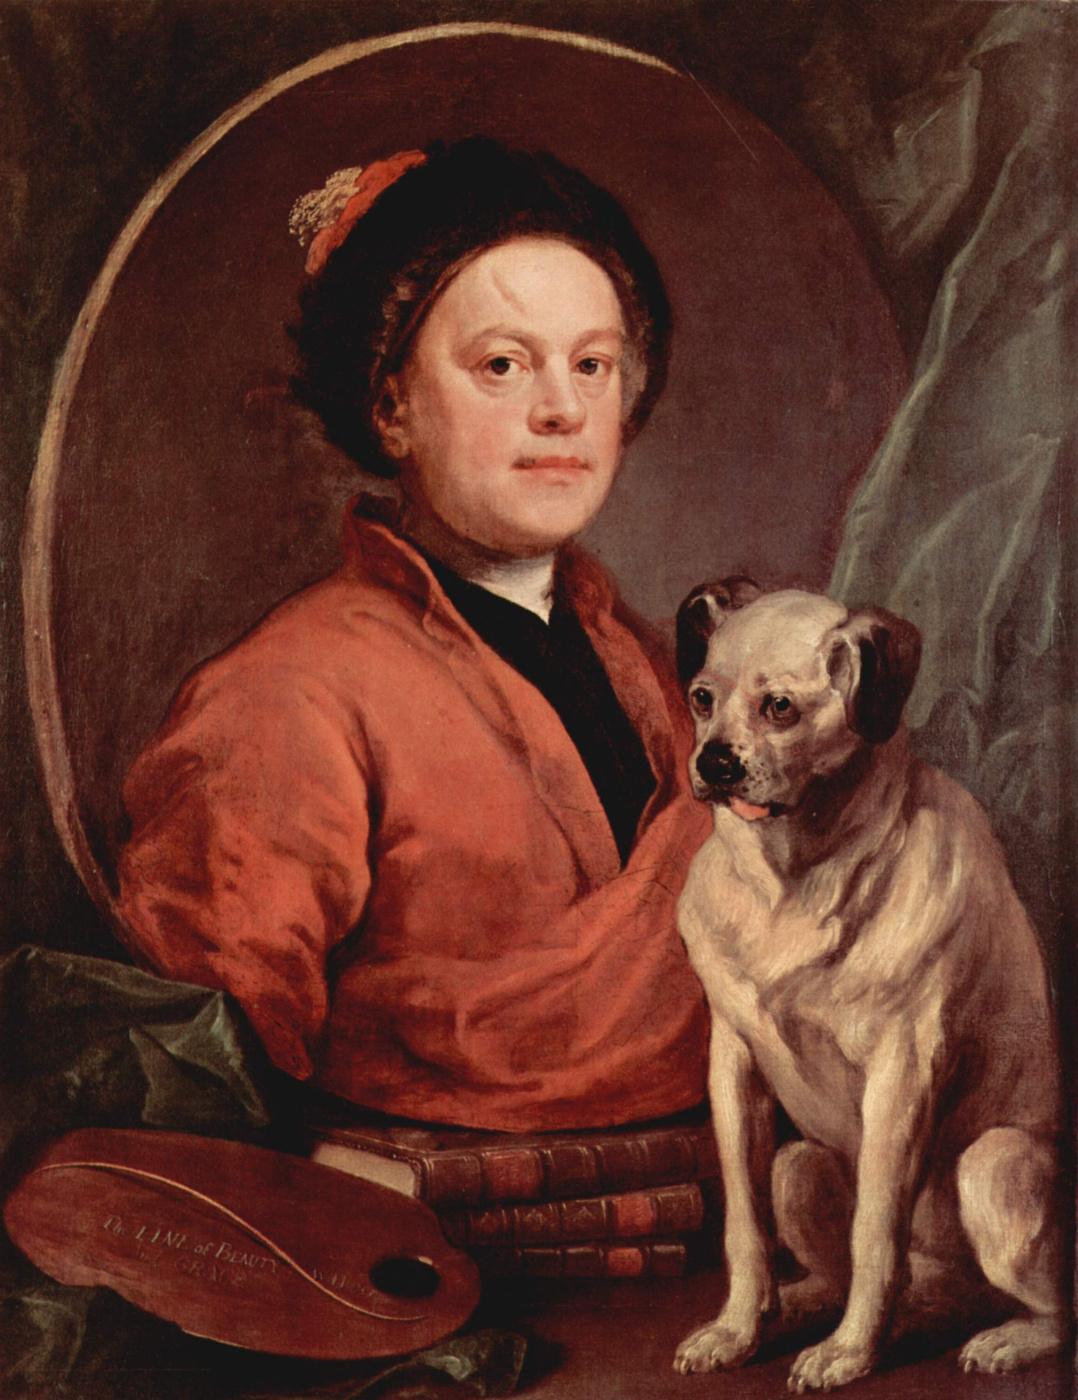 William Hogarth. Self-portrait with dog